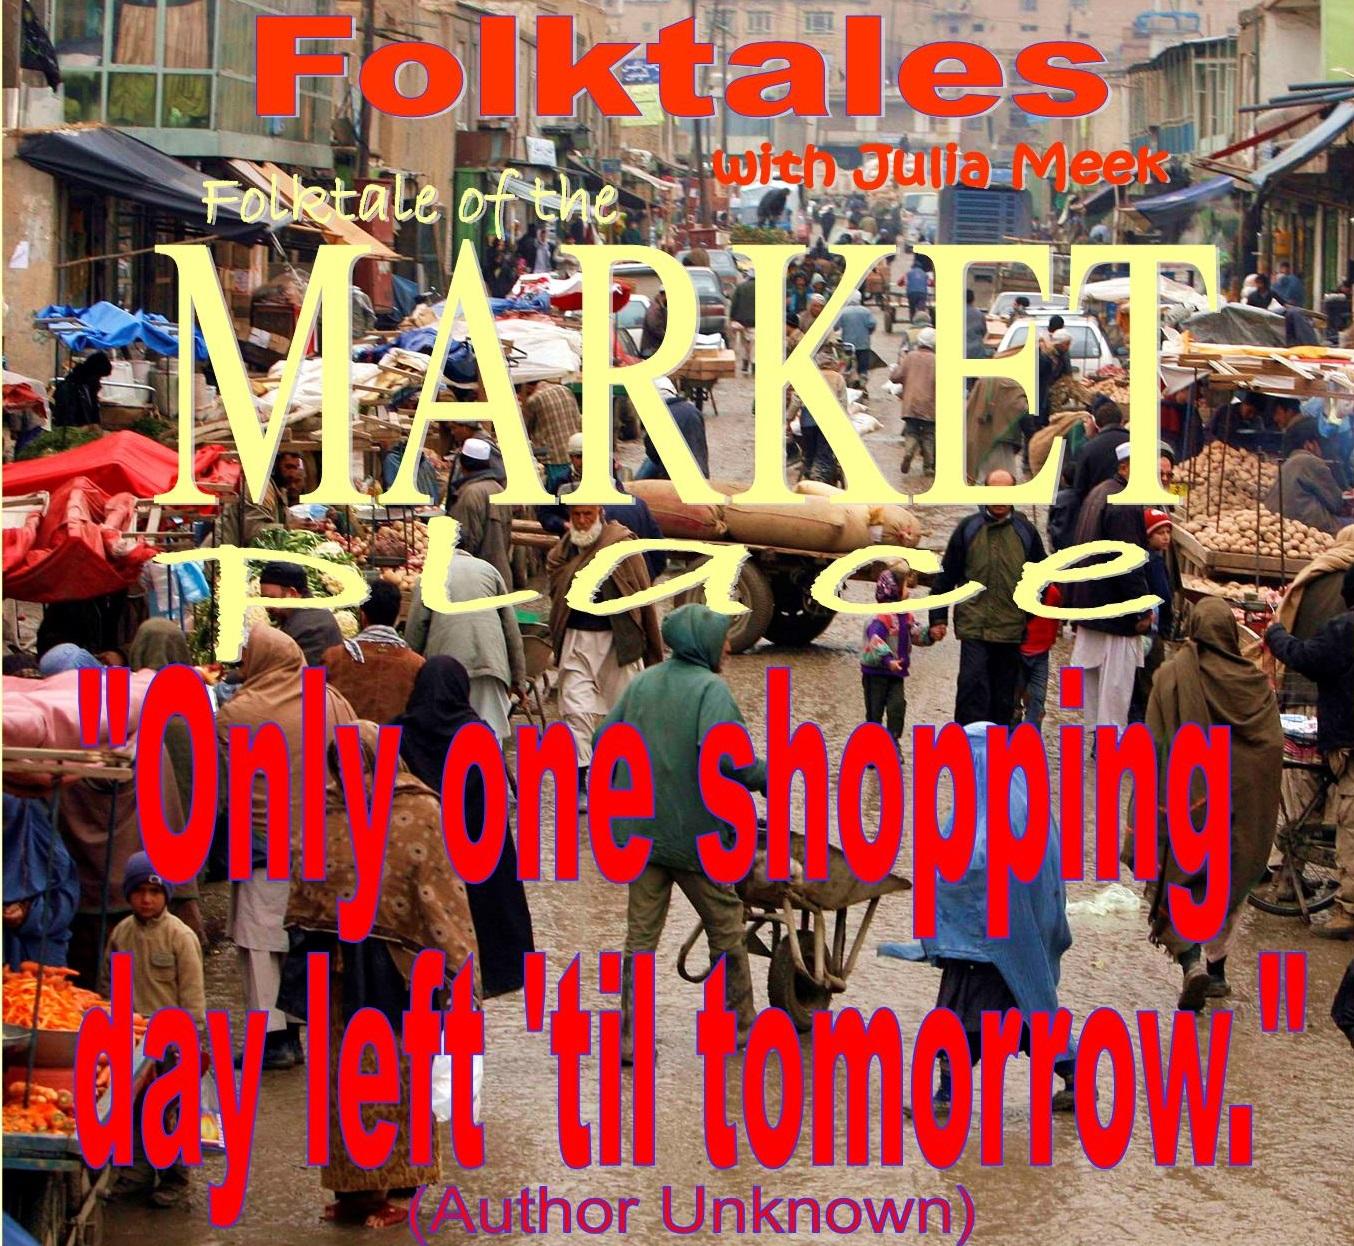 Caption: WBOI's Folktale of the Market Place, Credit: Julia Meek